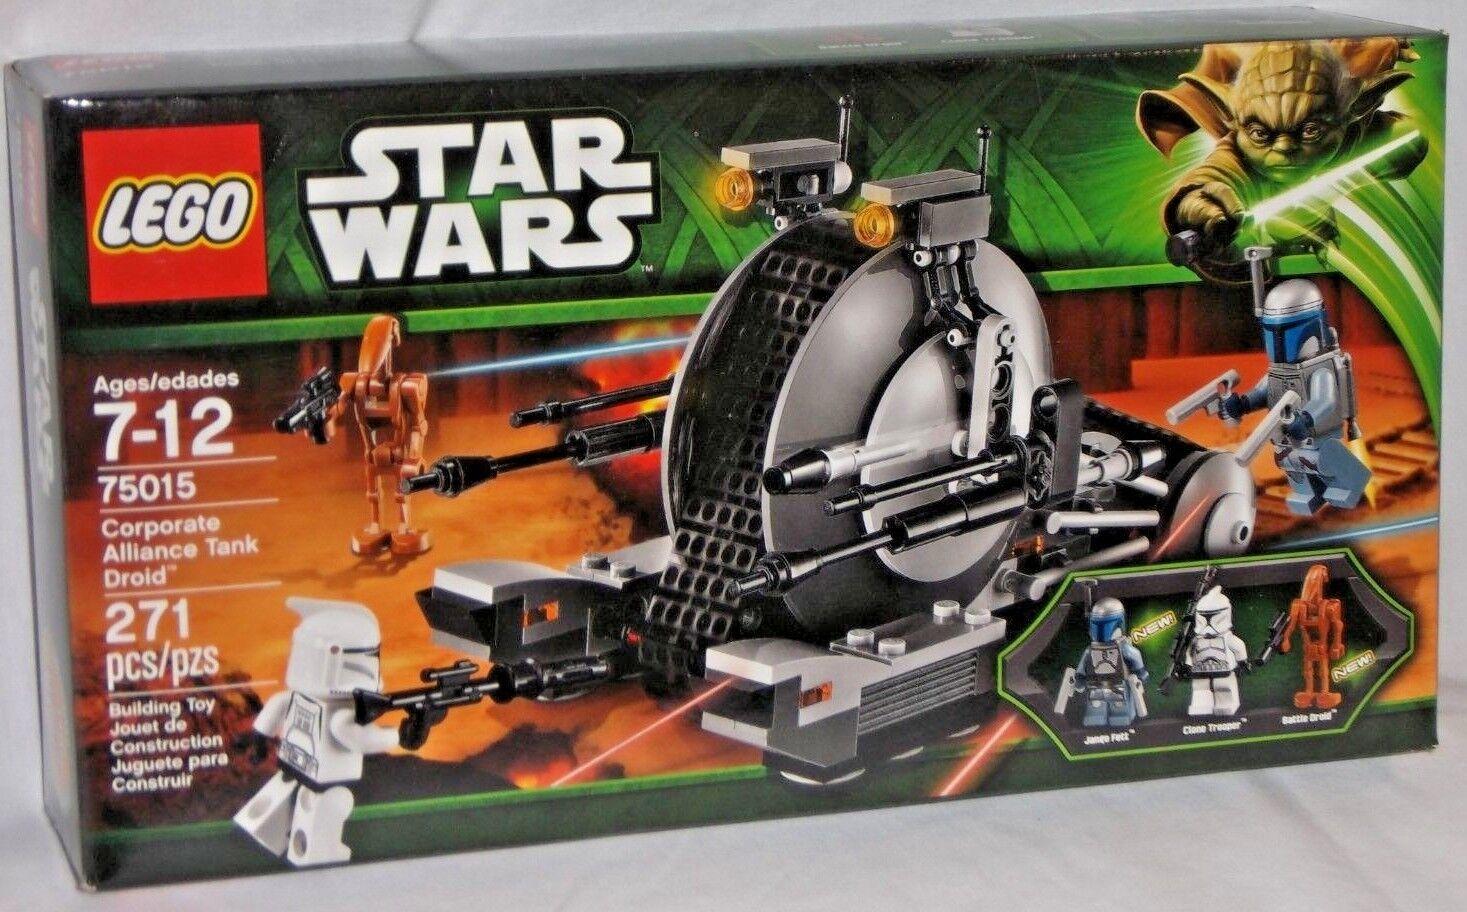 SEALED 75015 LEGO Star Wars CORPORATE ALLIANCE TANK DROID Jango Fett Clone 271pc